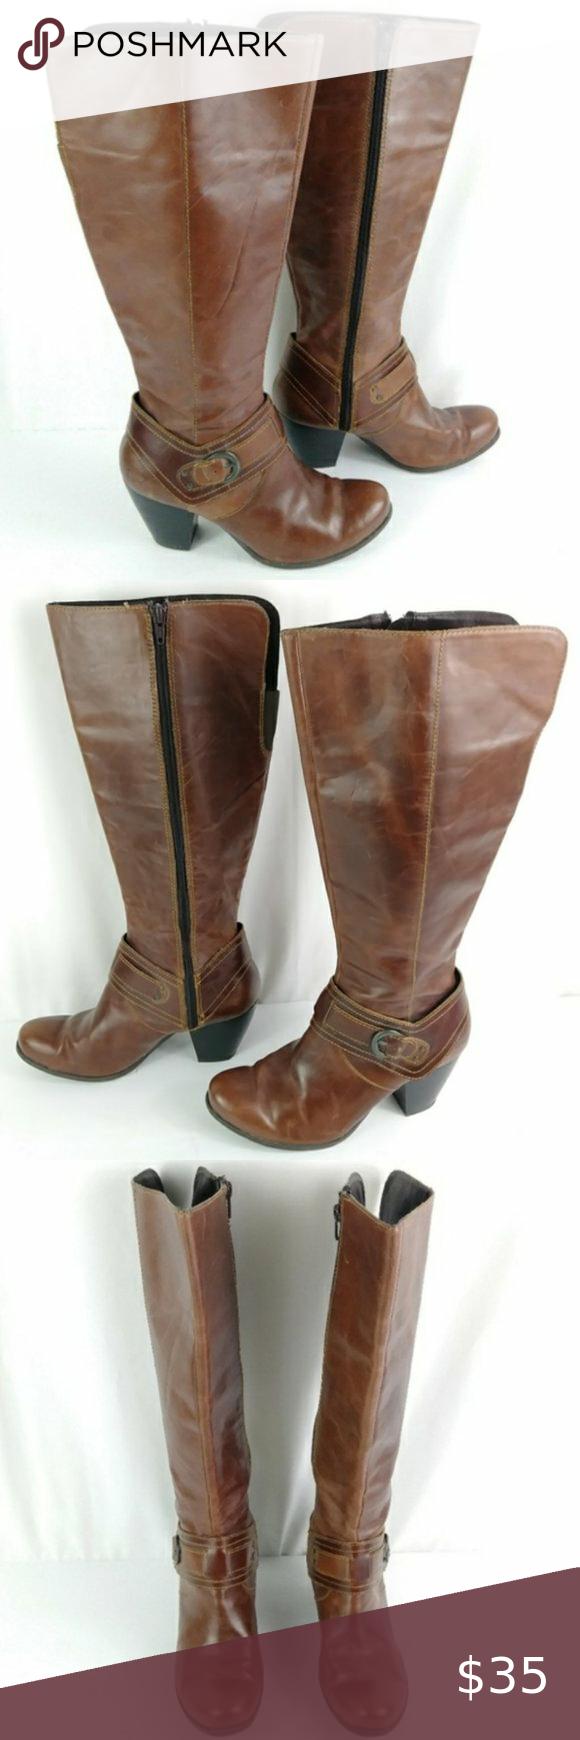 💥Sale b.o.c. Leather Heeled Boots size